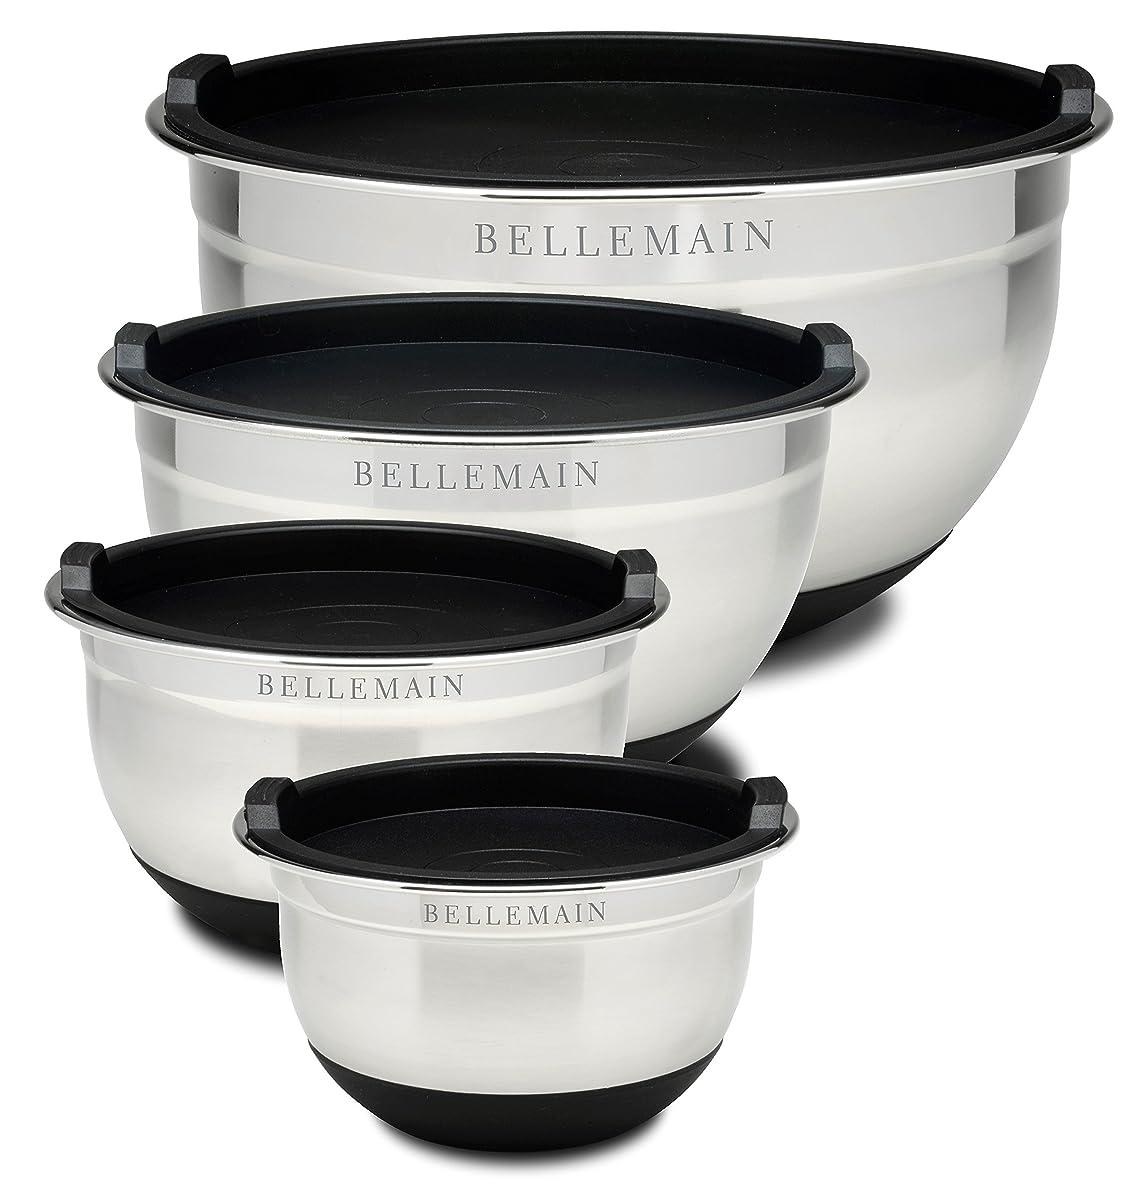 Top Rated Bellemain Stainless Steel Non-Slip Mixing Bowls with Lids, 4 Piece Set Includes 1 Qt., 1.5 Qt., 3 Qt. & 5 Qt.